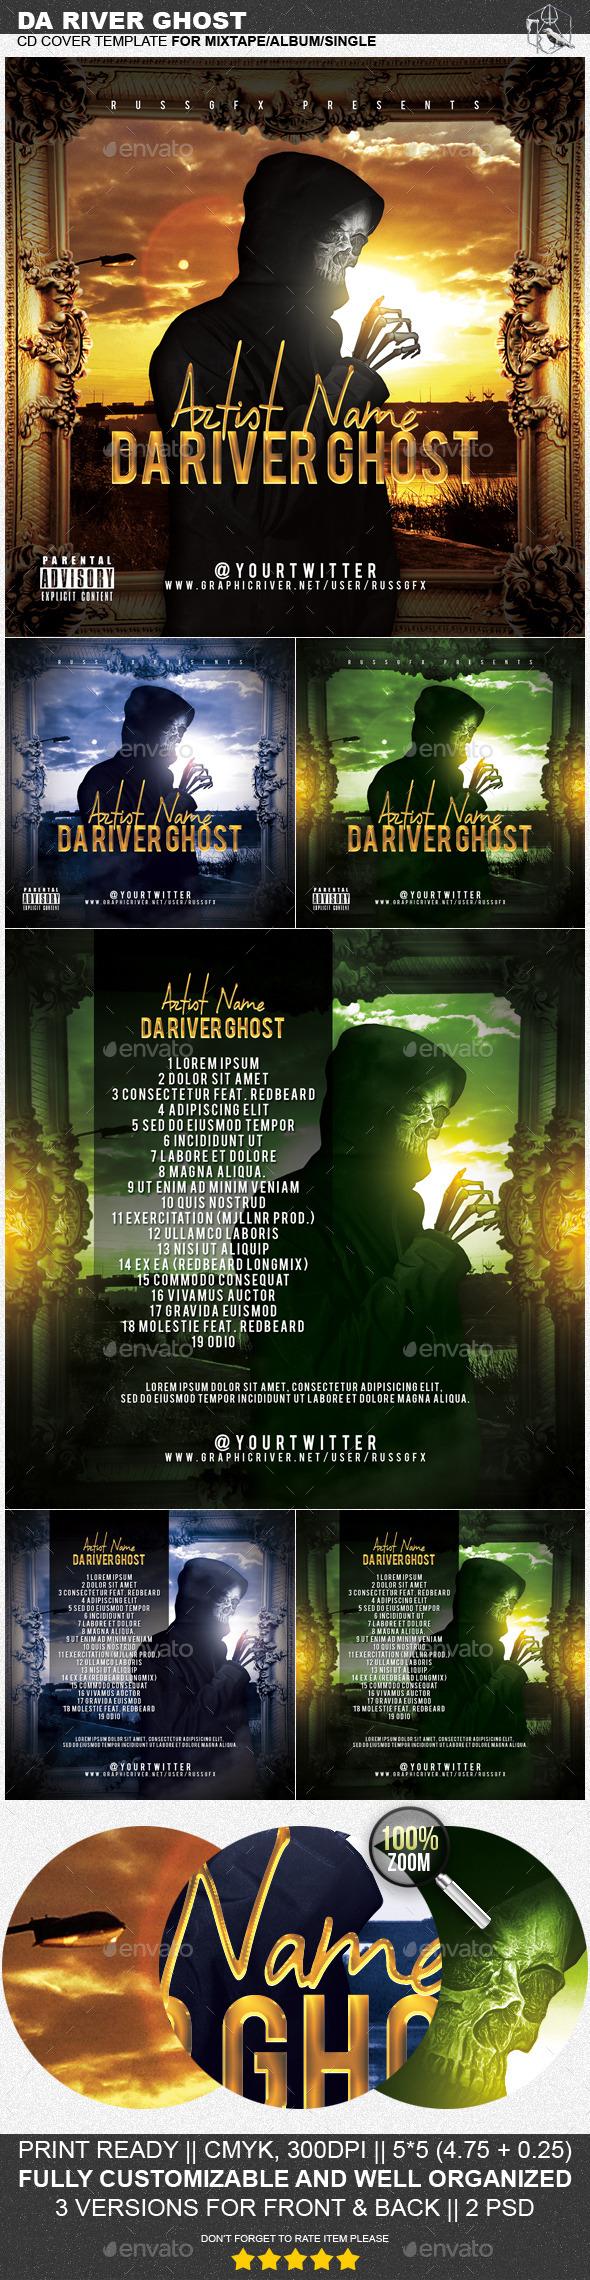 Da River Ghost PSD CD Mixtape Cover Template - CD & DVD Artwork Print Templates